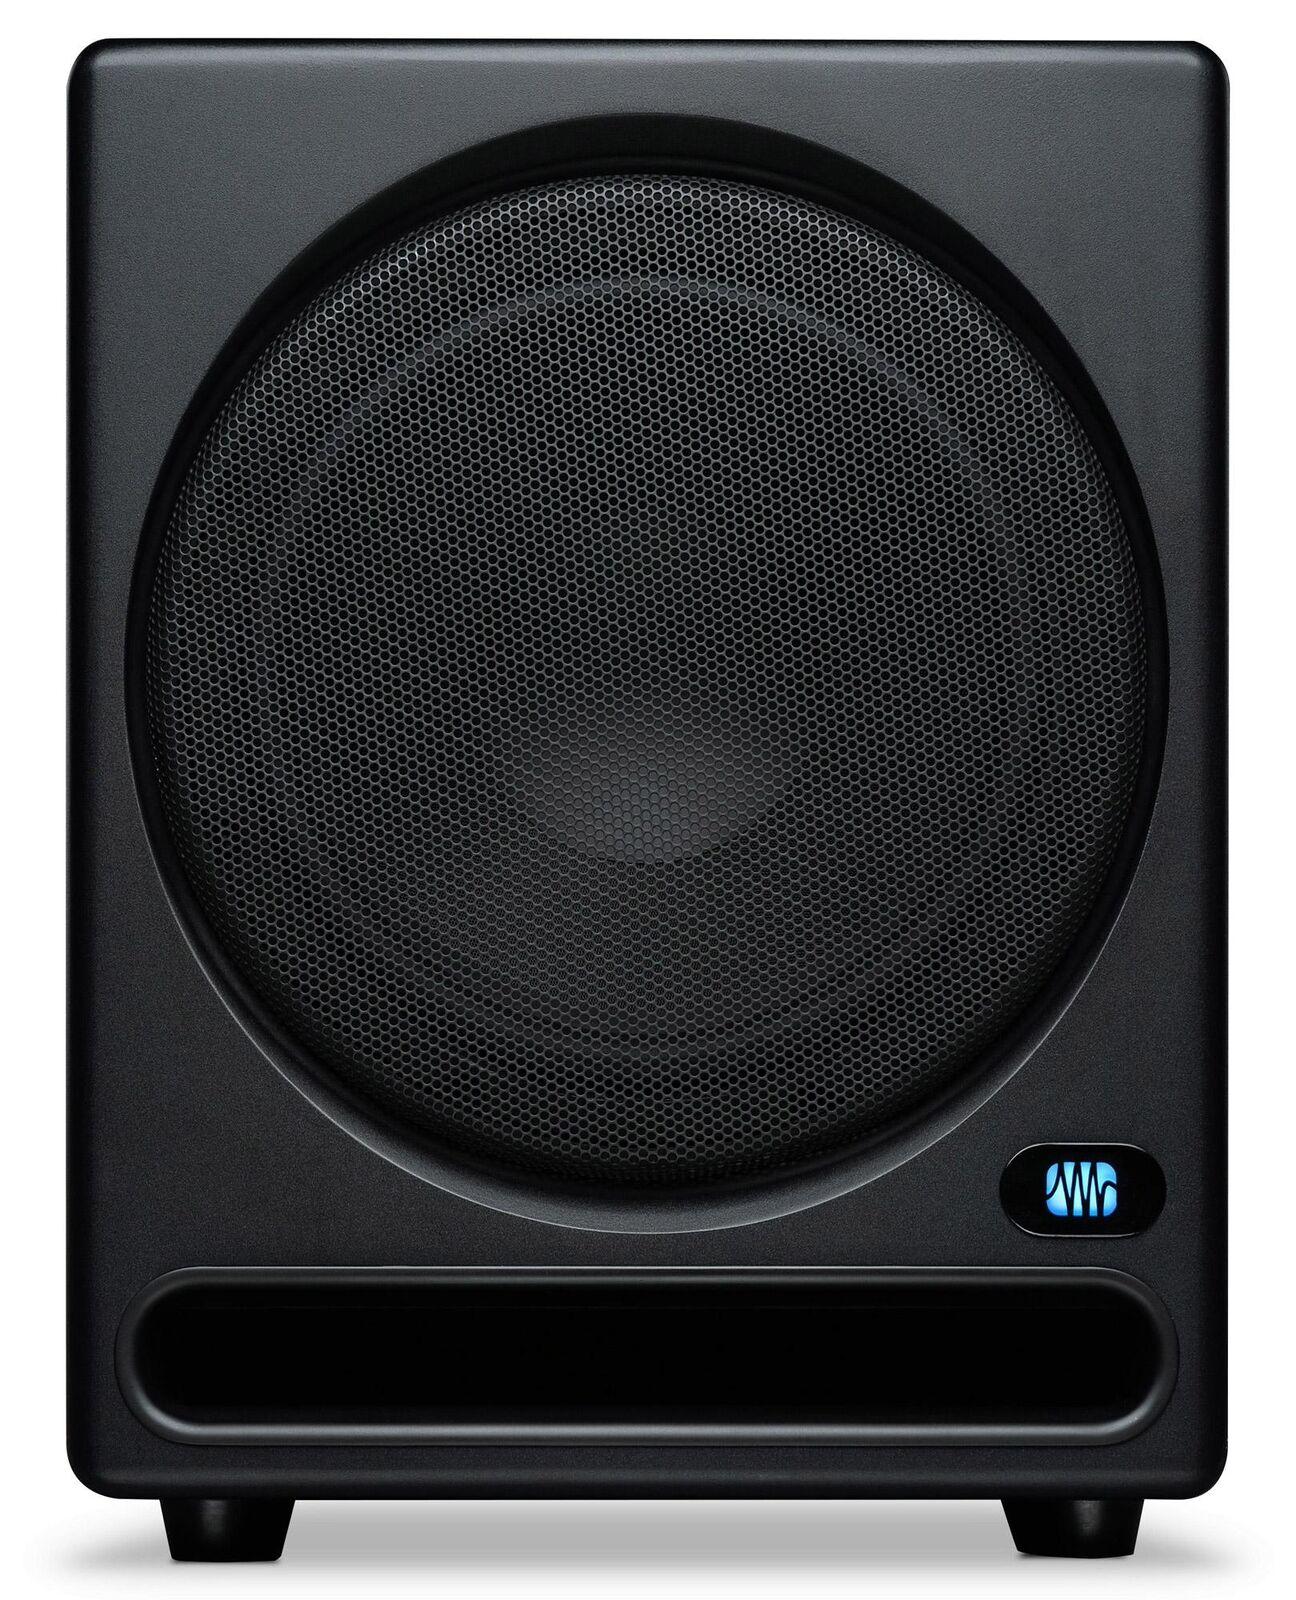 Studio Studio Studio activo-subwoofer con 250 vatios, complemento ideal para fullrange-monitores 9d2c75